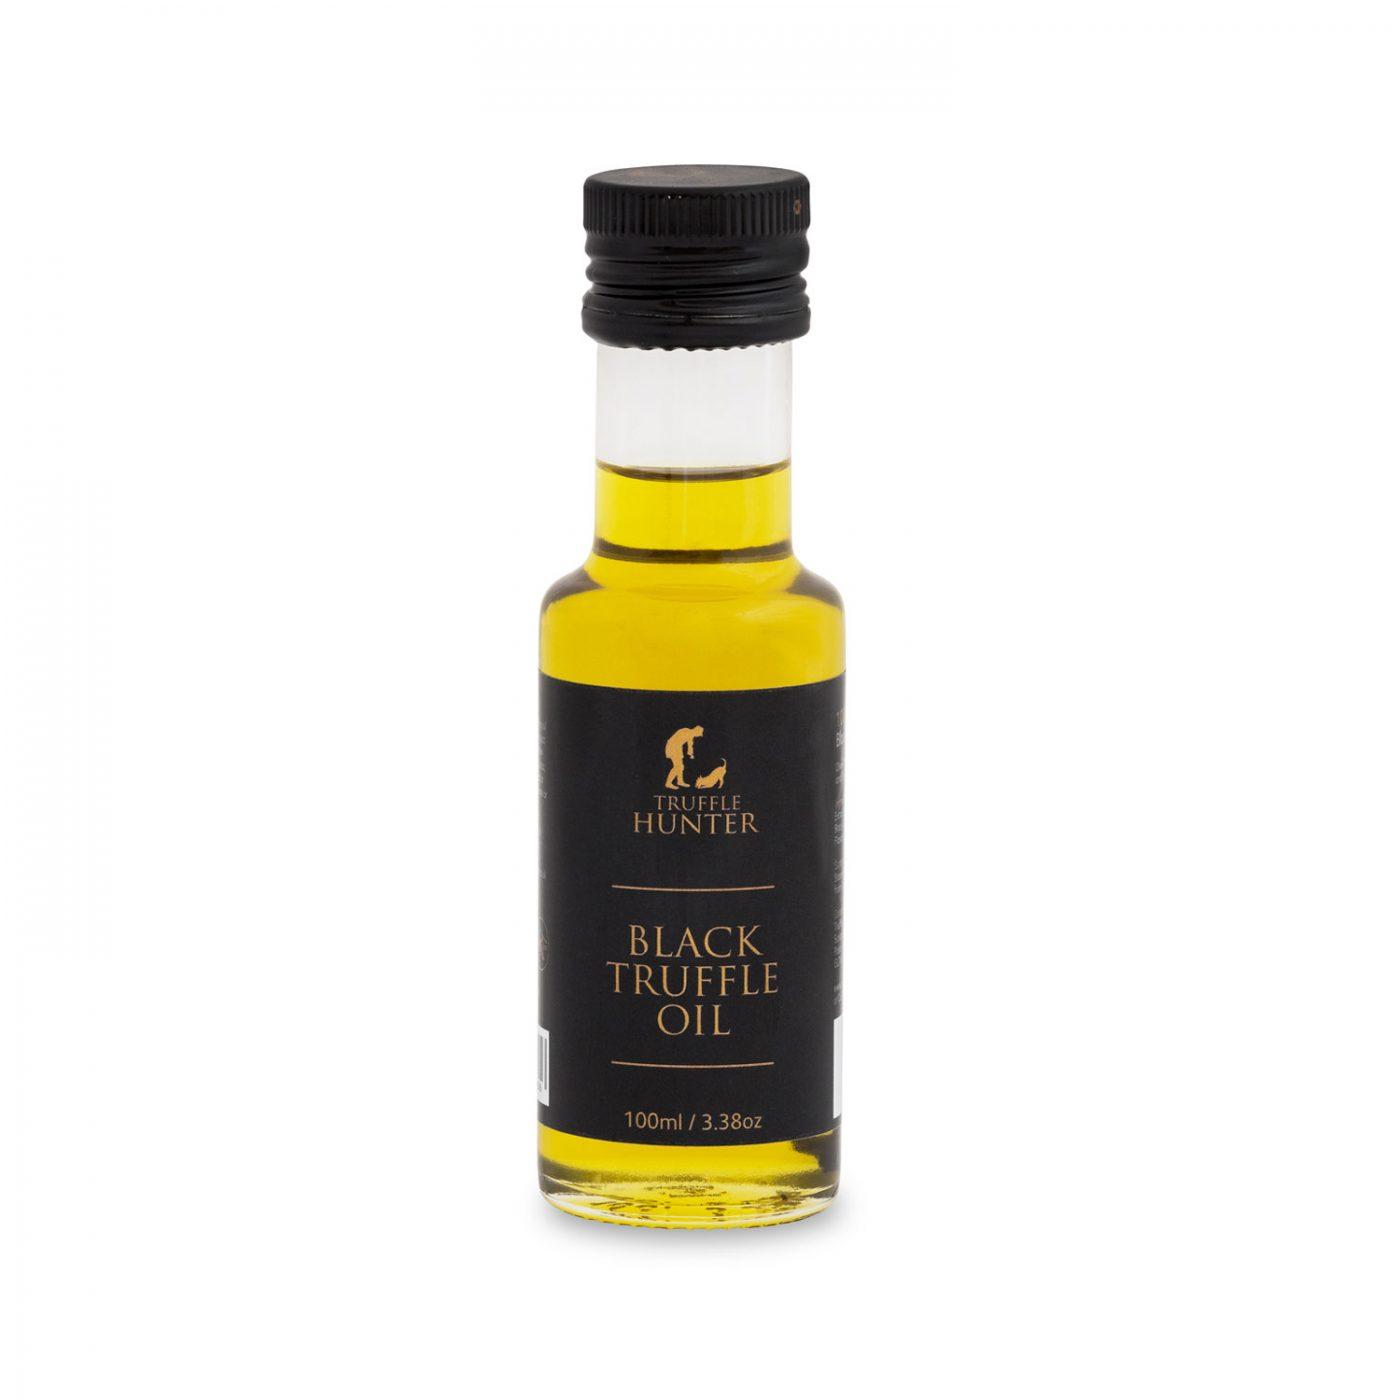 Truffle Hunter Black Truffle Oil